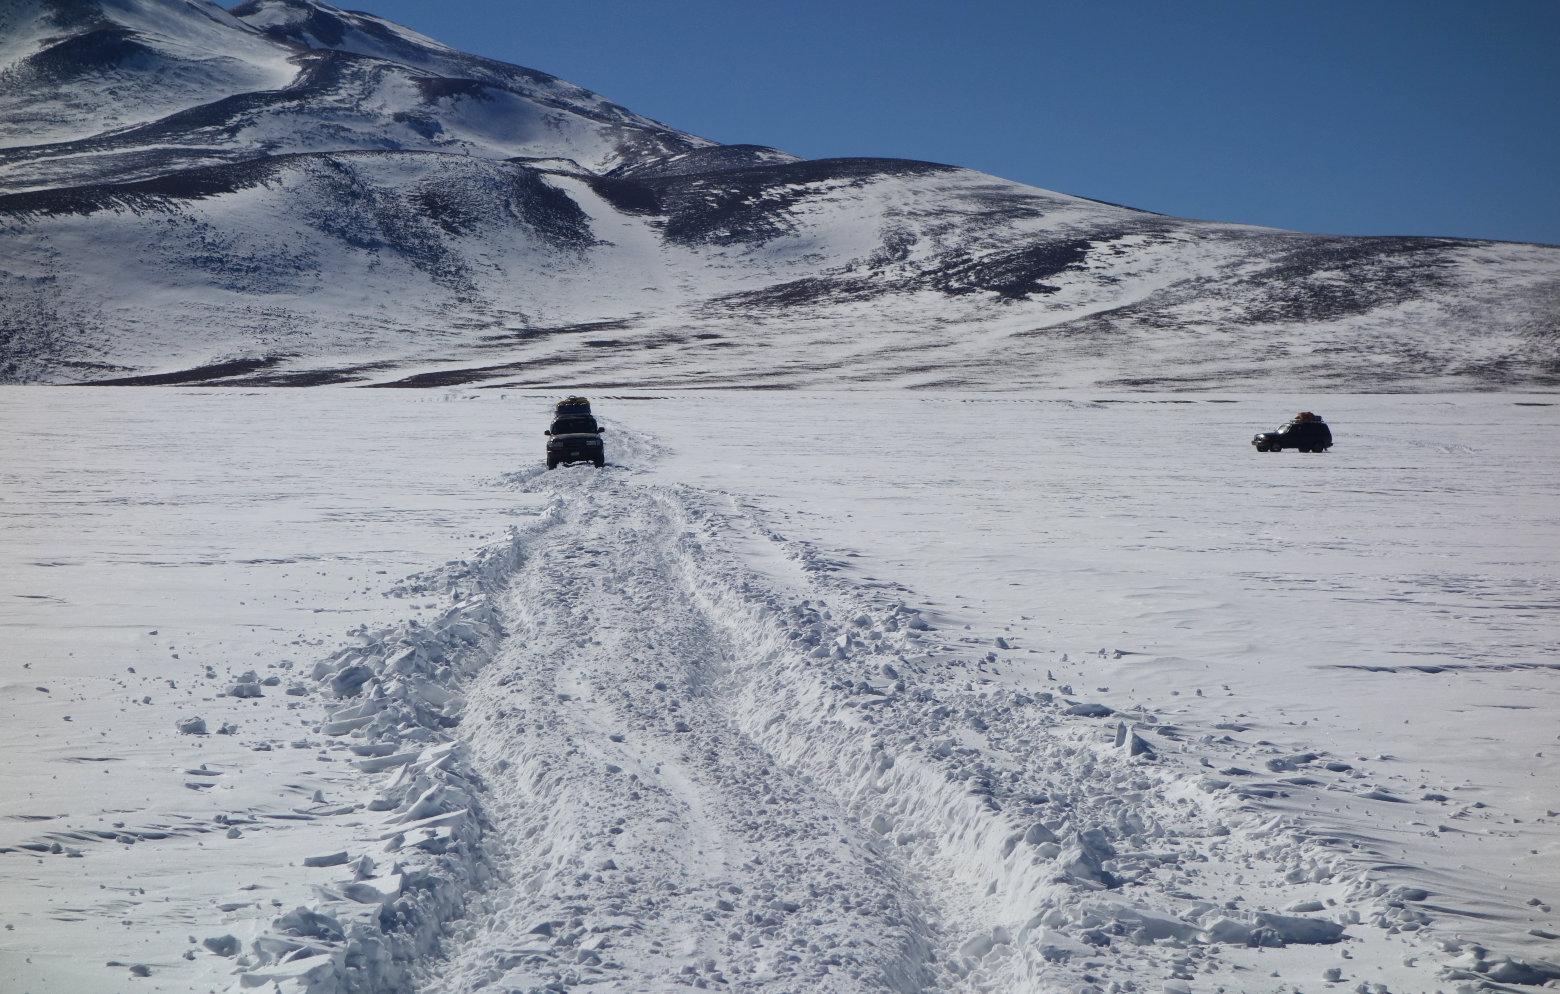 Bolivien Salar de Uyuni Jeep im Schnee